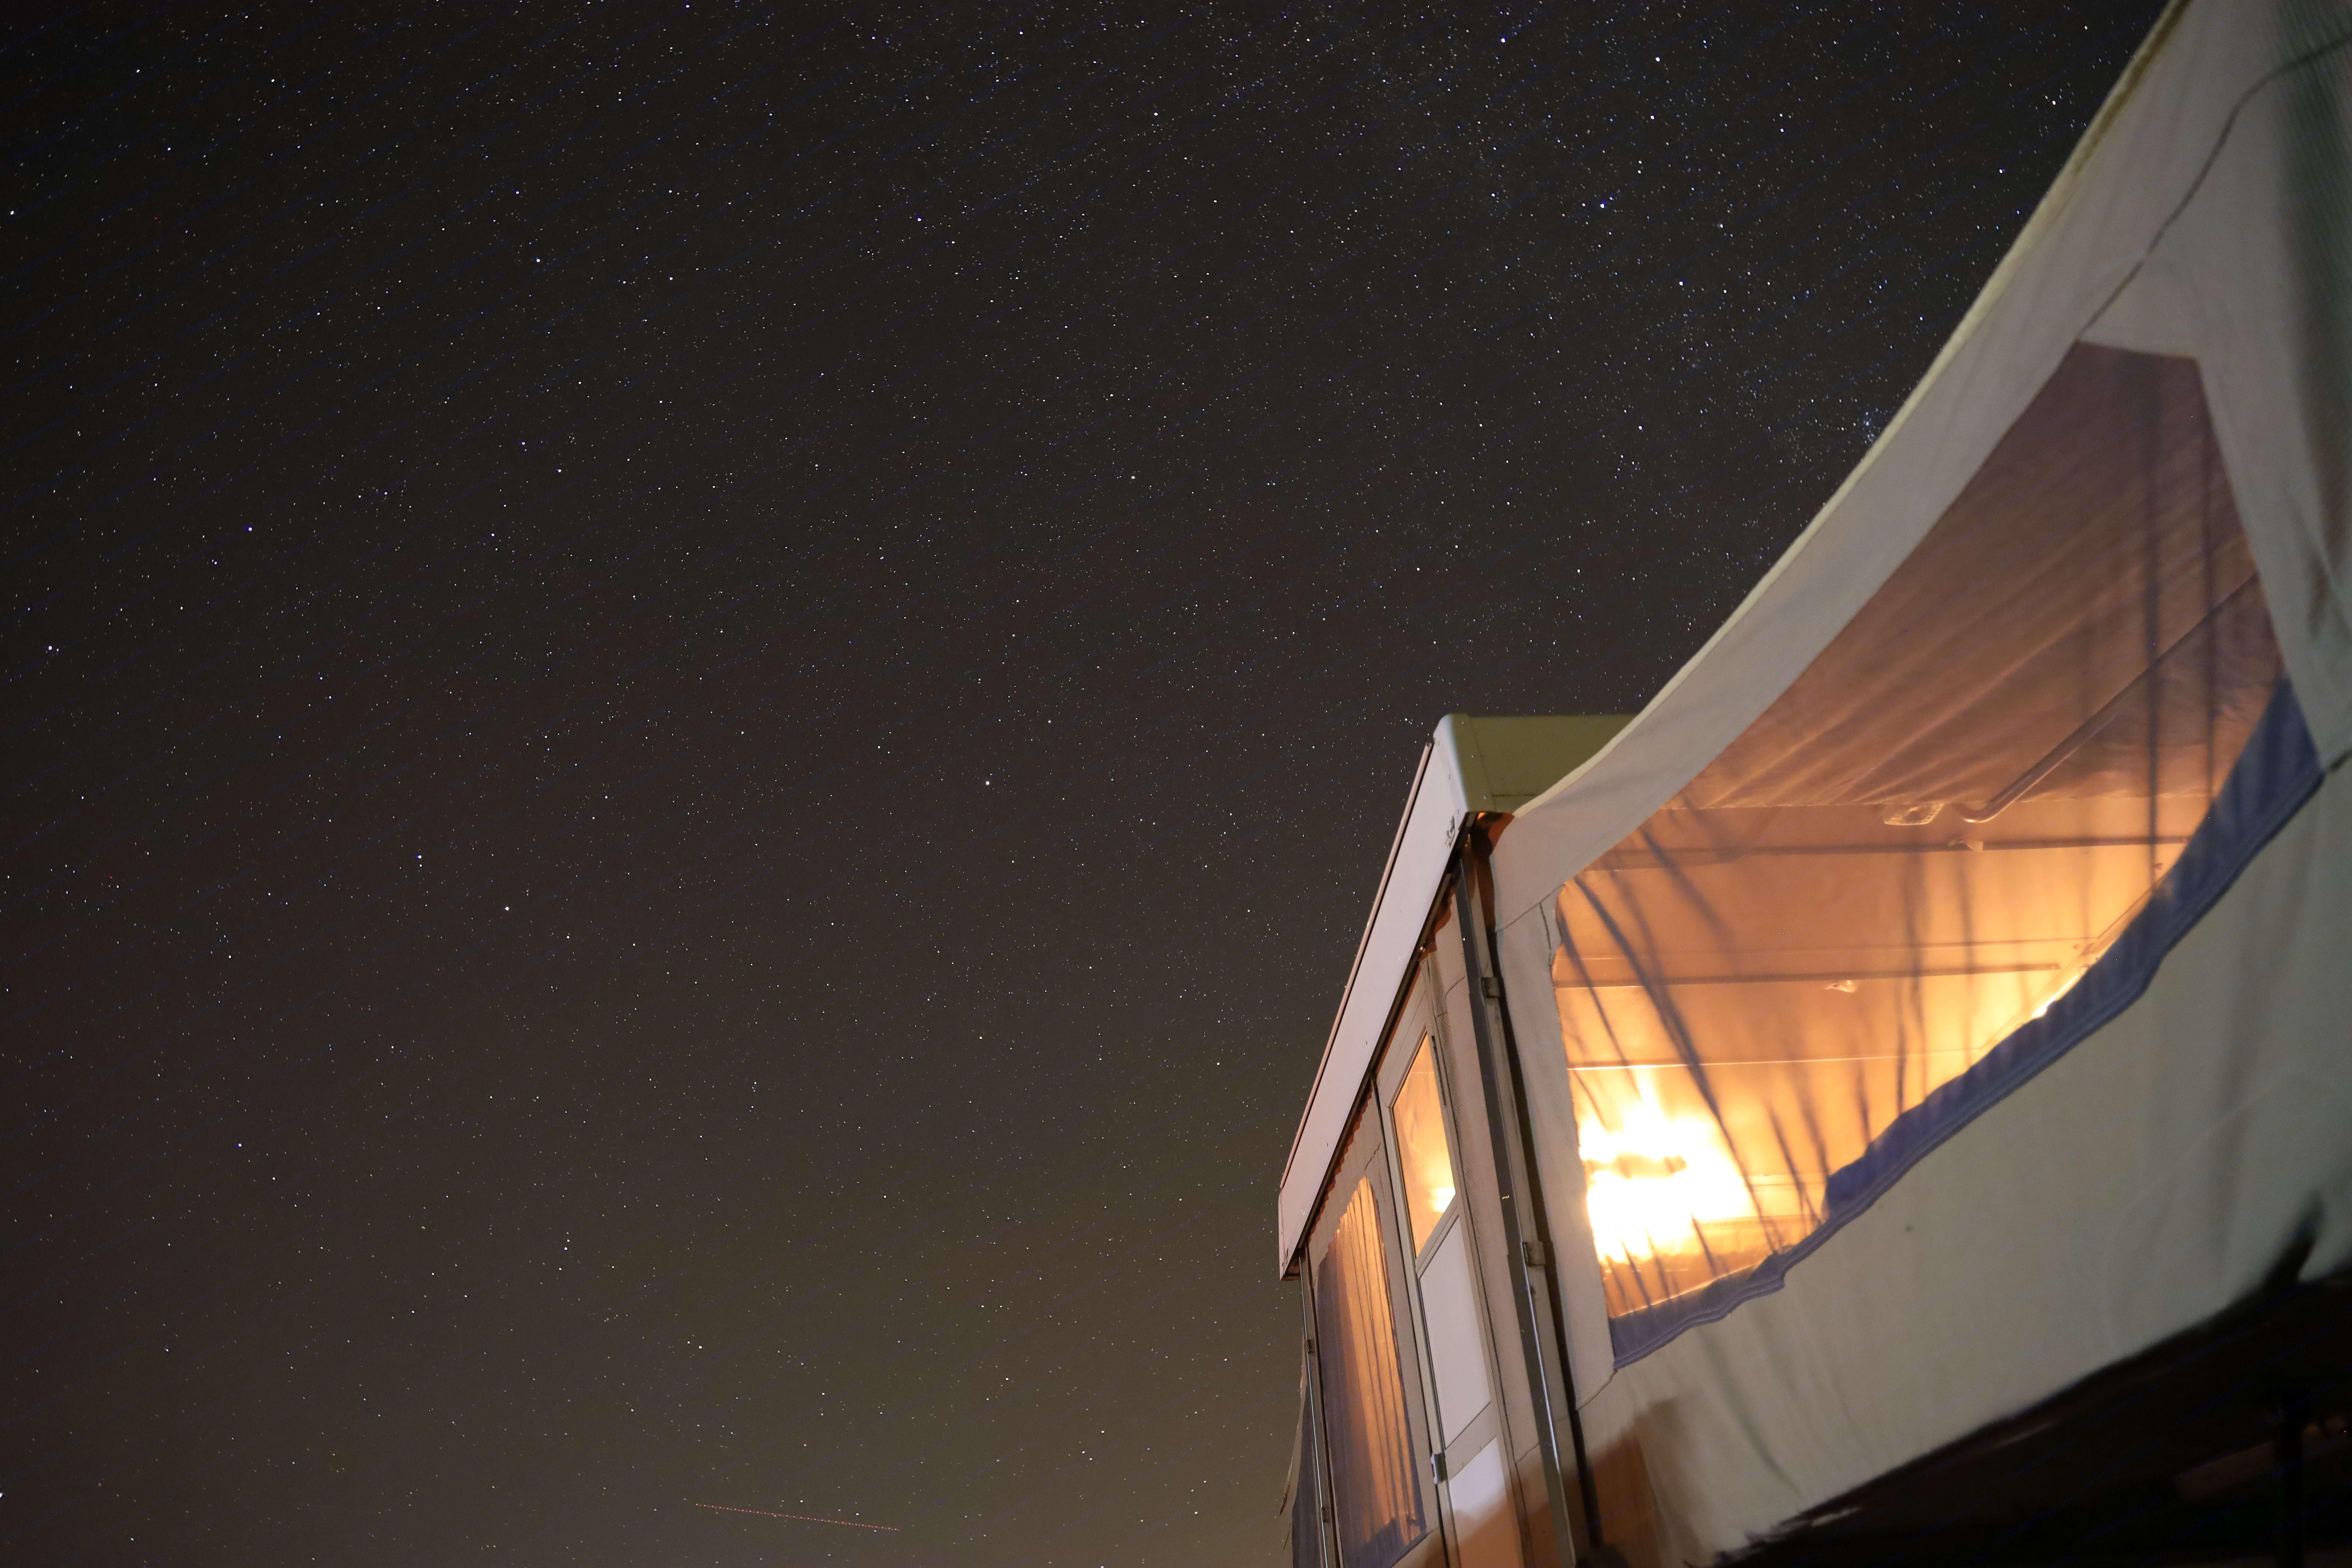 A beautiful star filled night in Joshua Tree, CA . Coleman Royal 1985